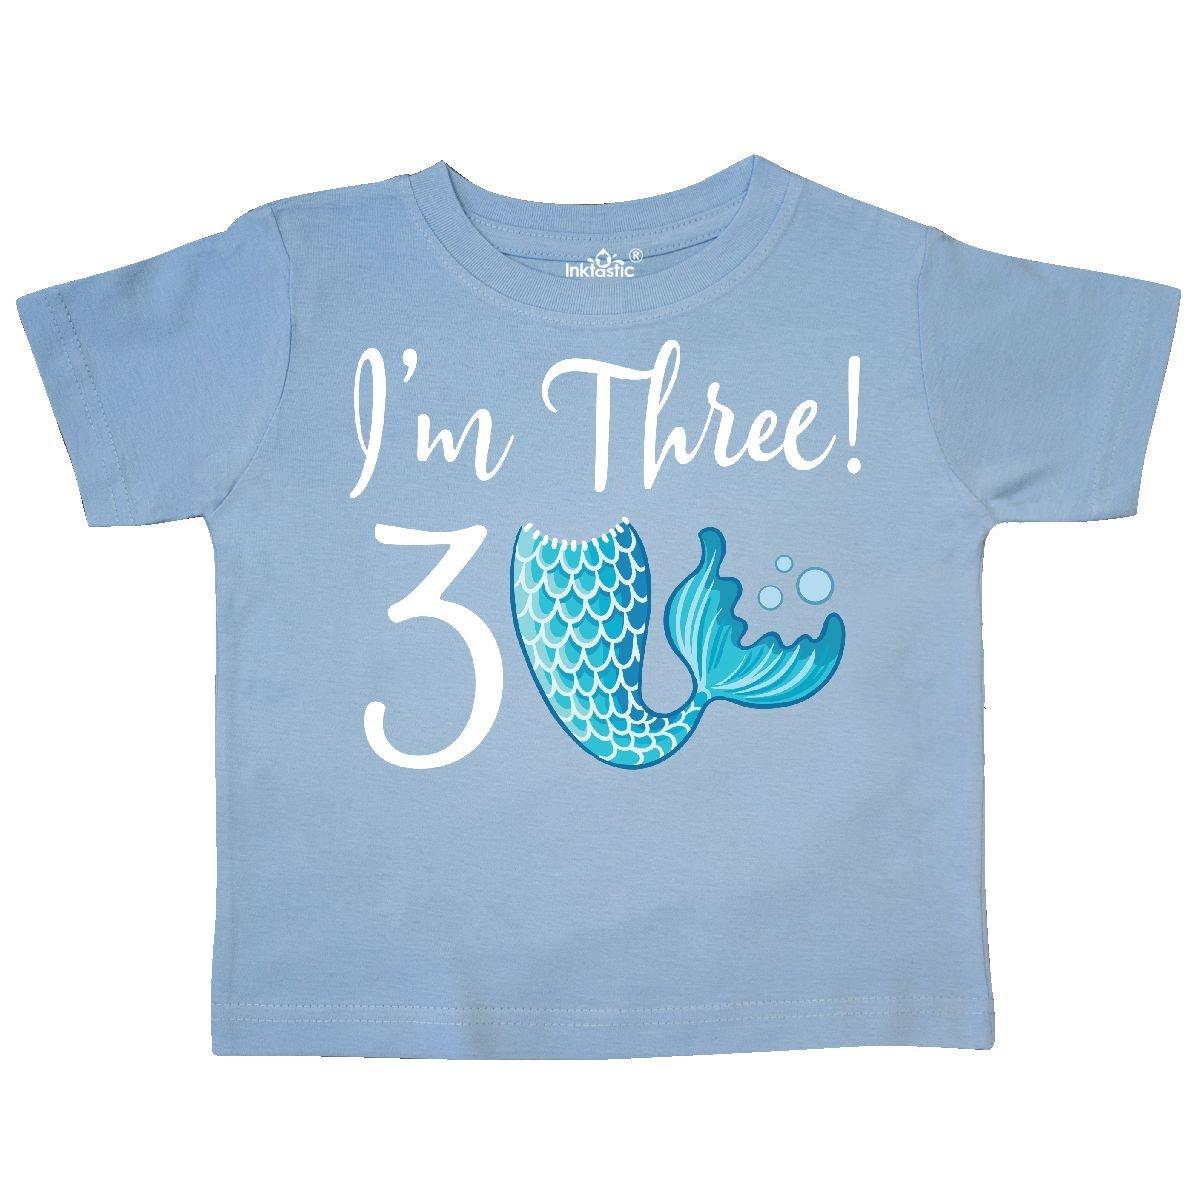 3rd Birthday Mermaid Party Toddler T-Shirt 2c574 inktastic